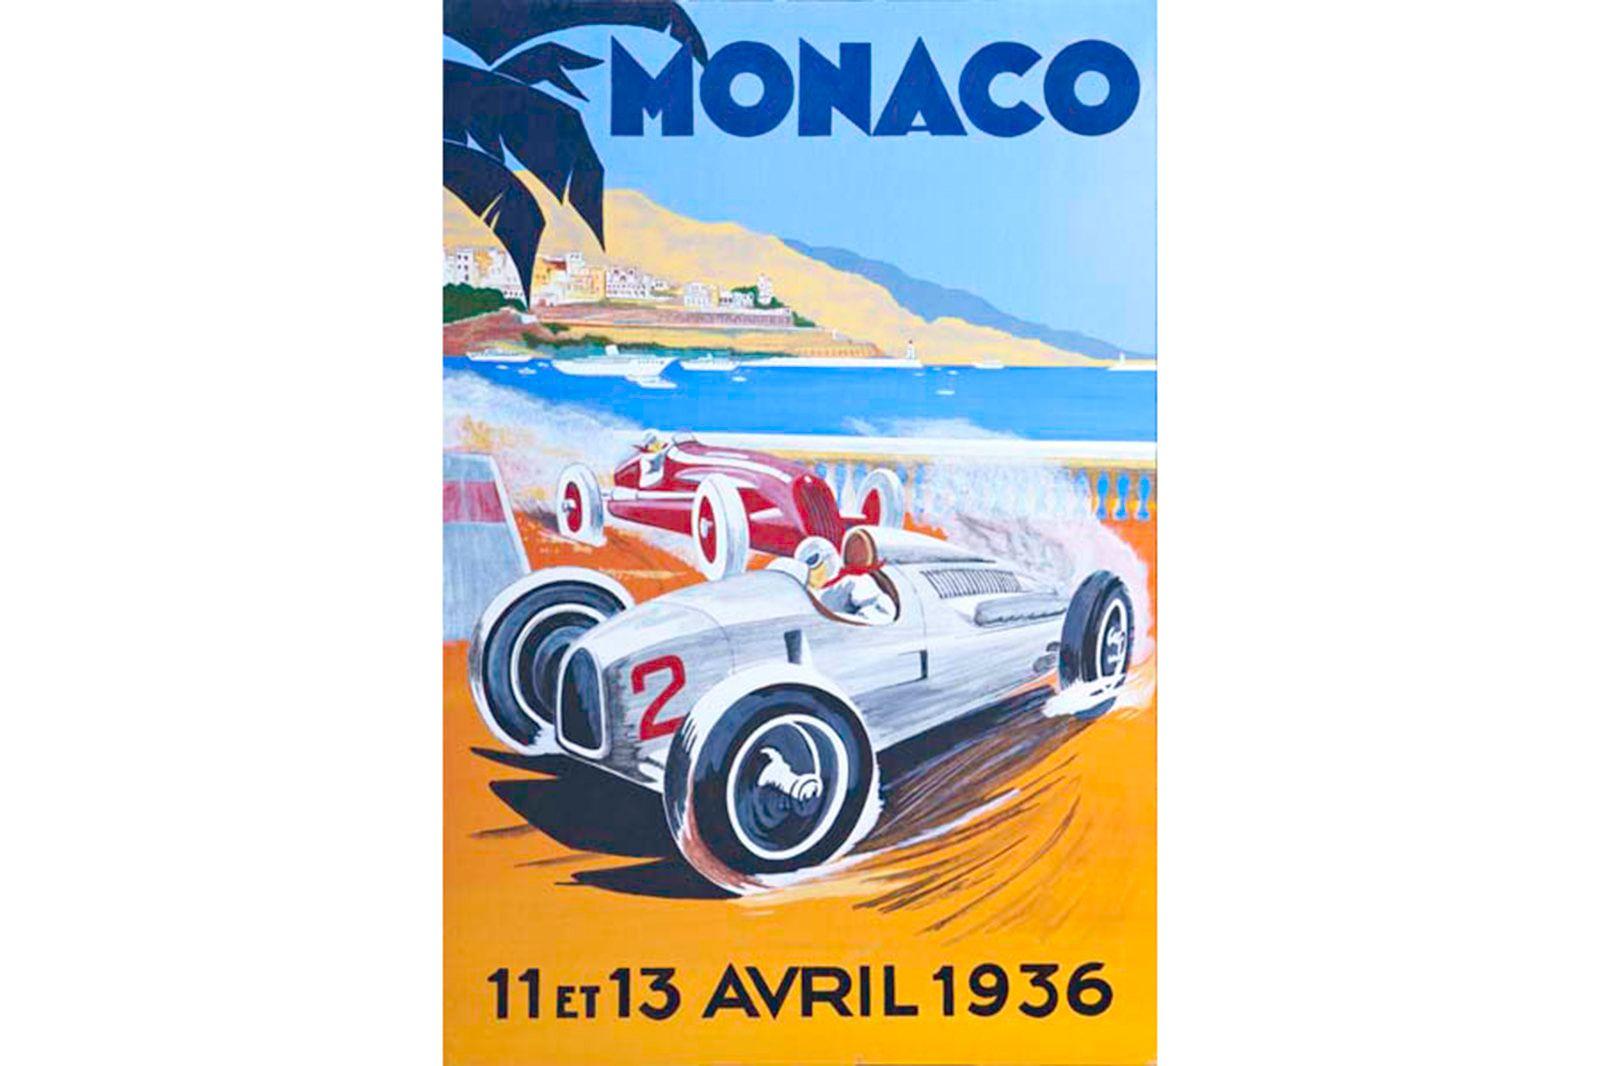 Vinyl Hanging Poster - Monoco 11et 13